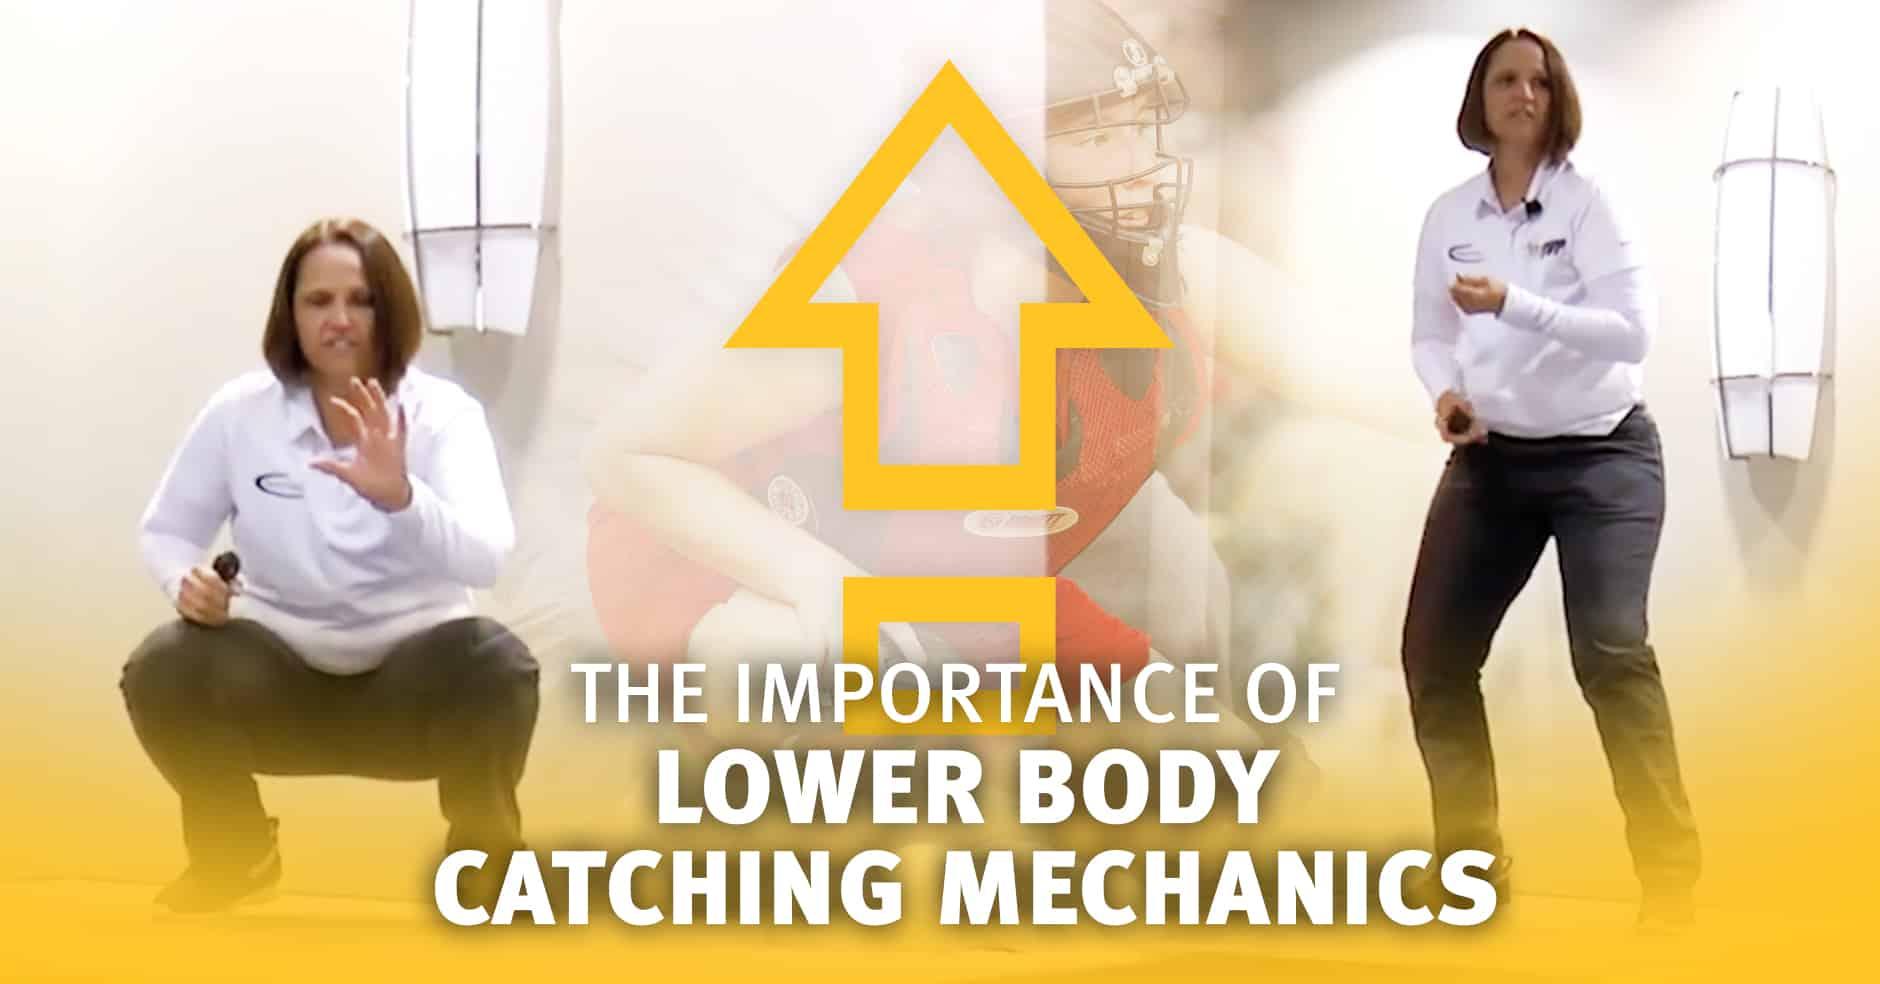 Catching The Importance Of Lower Body Mechanics